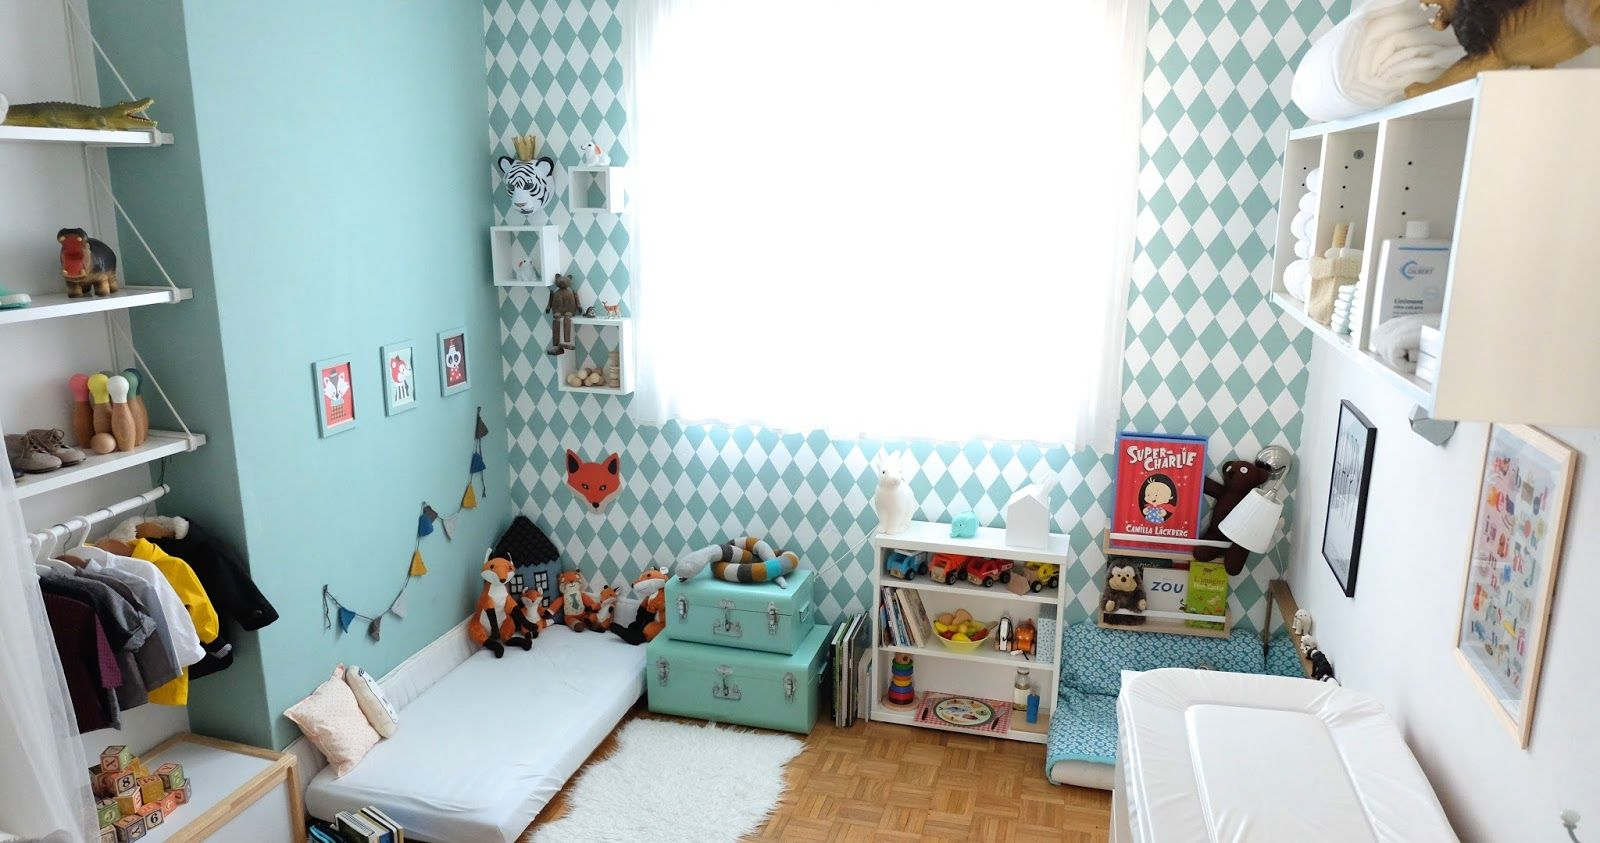 Habitacicbnmontessorig maxito room pinterest